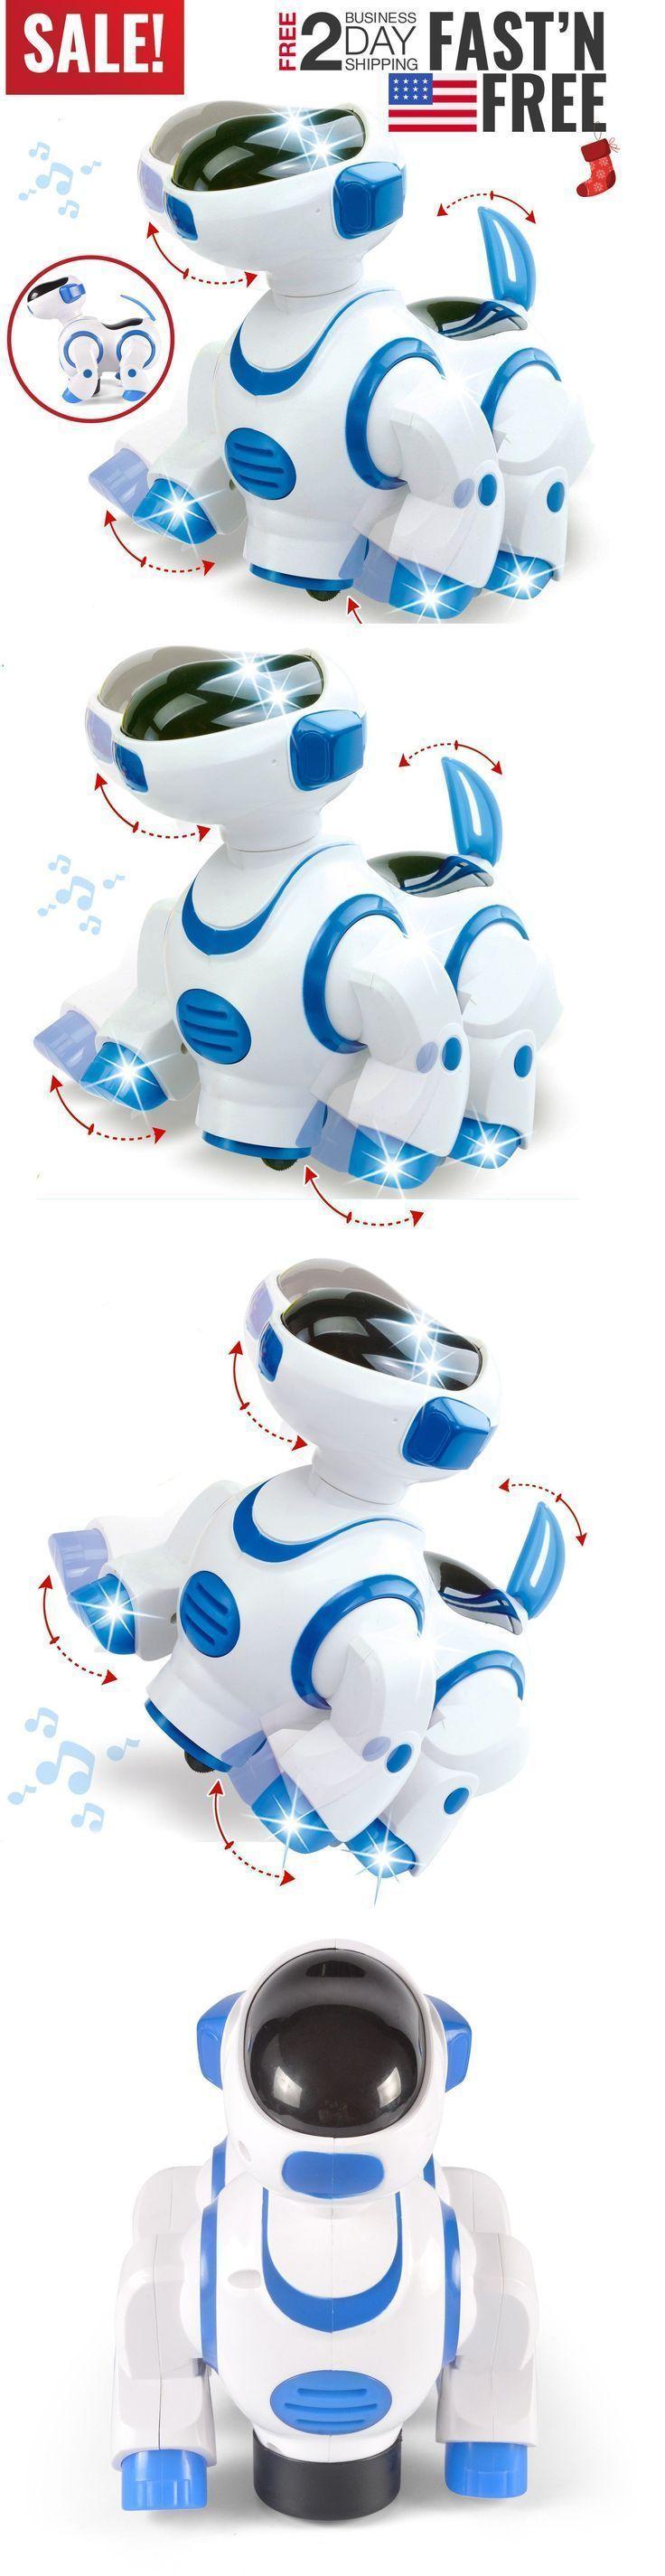 Spielzeug Roboter Fã R Mã Dchen